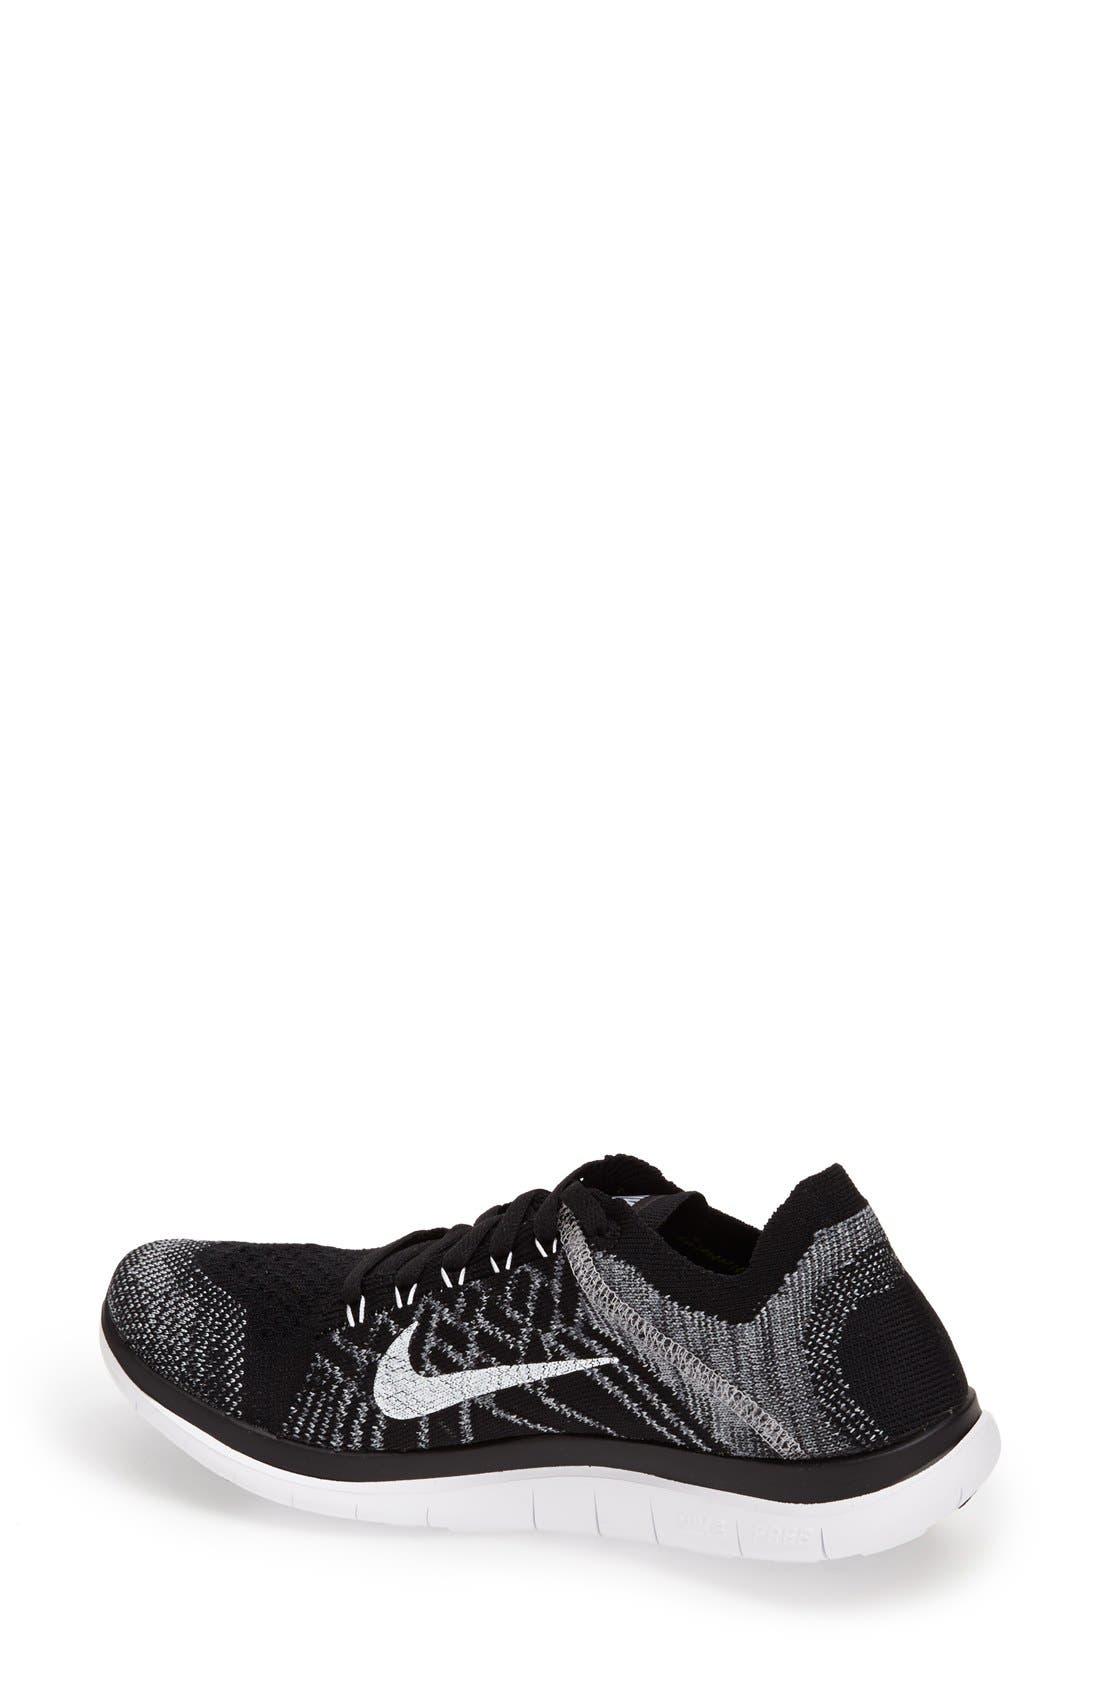 NIKE, 'Free 4.0 Flyknit' Running Shoe, Alternate thumbnail 2, color, 001